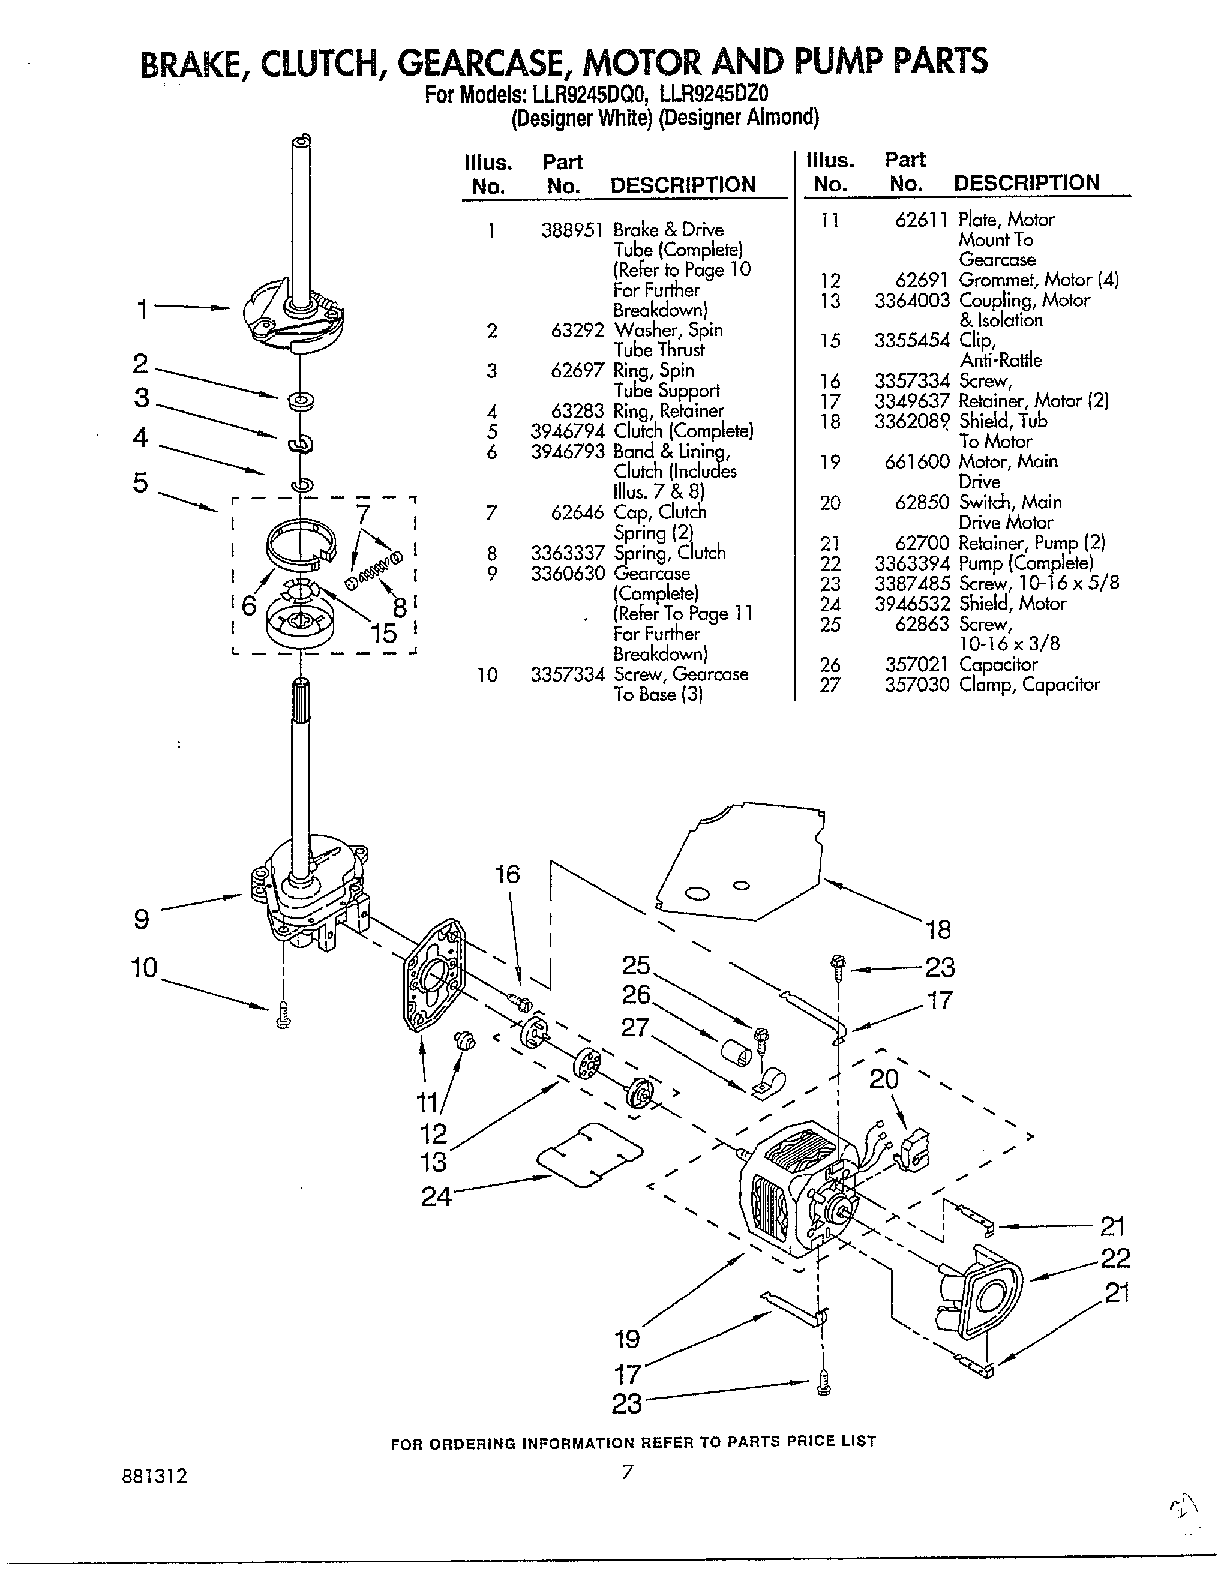 whirlpool llr9245dqo brake clutch gearcase motor and pump diagram [ 1224 x 1584 Pixel ]